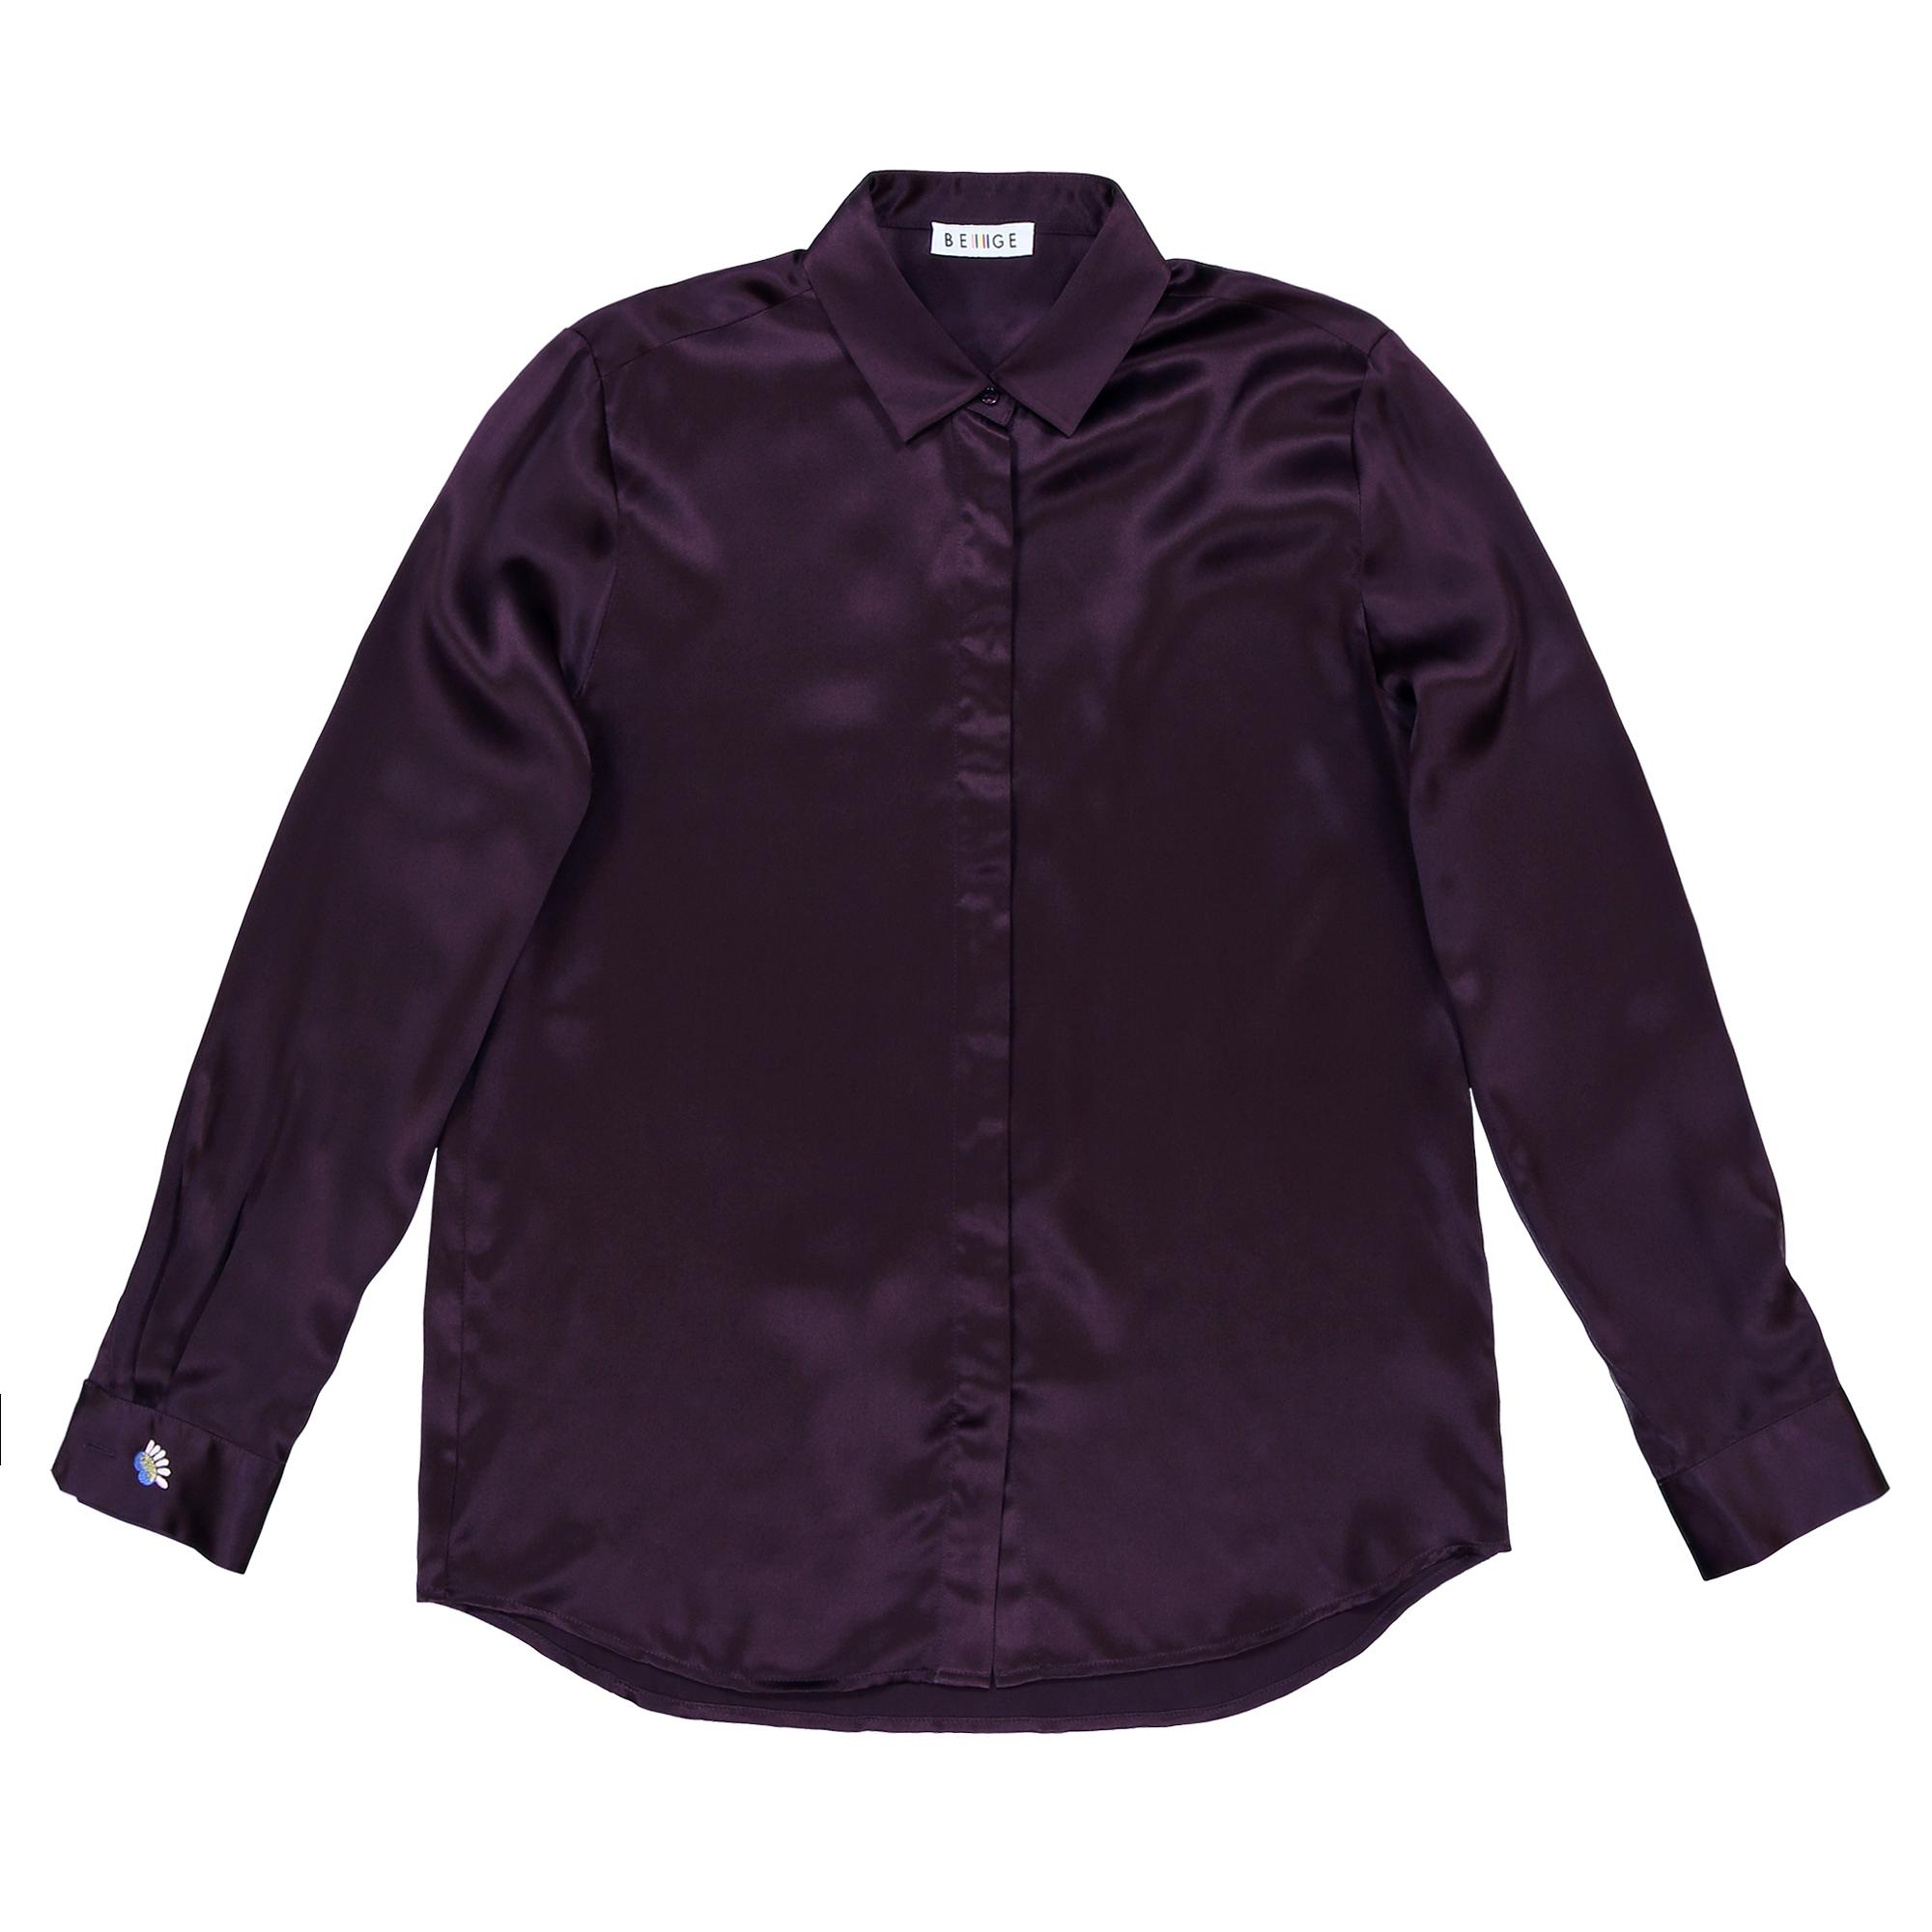 Silk+Shirt_Purple+Rain_1 (1).jpg